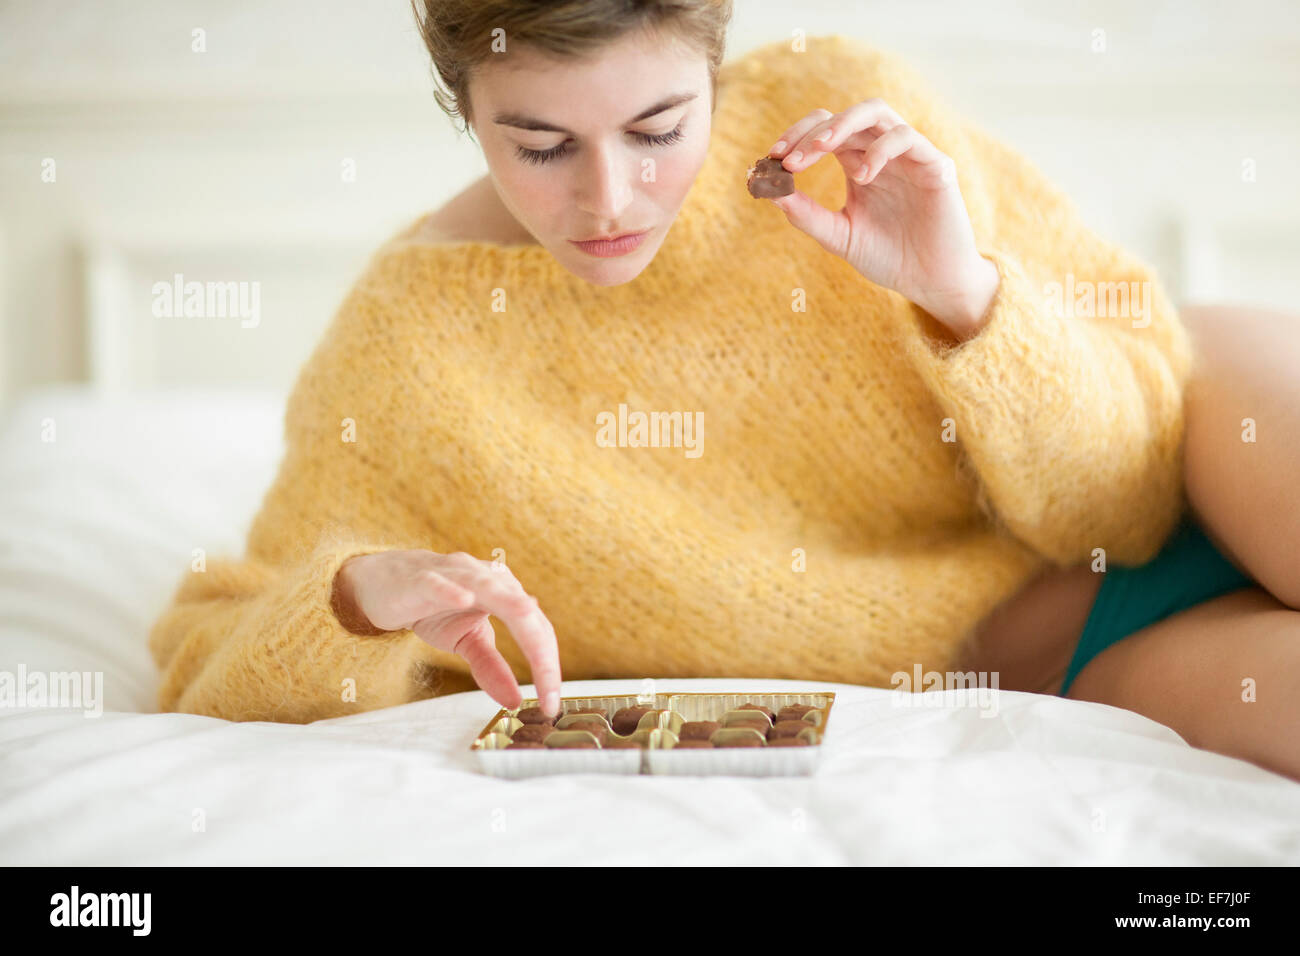 Frau auf Bett Schokolade essen Stockbild